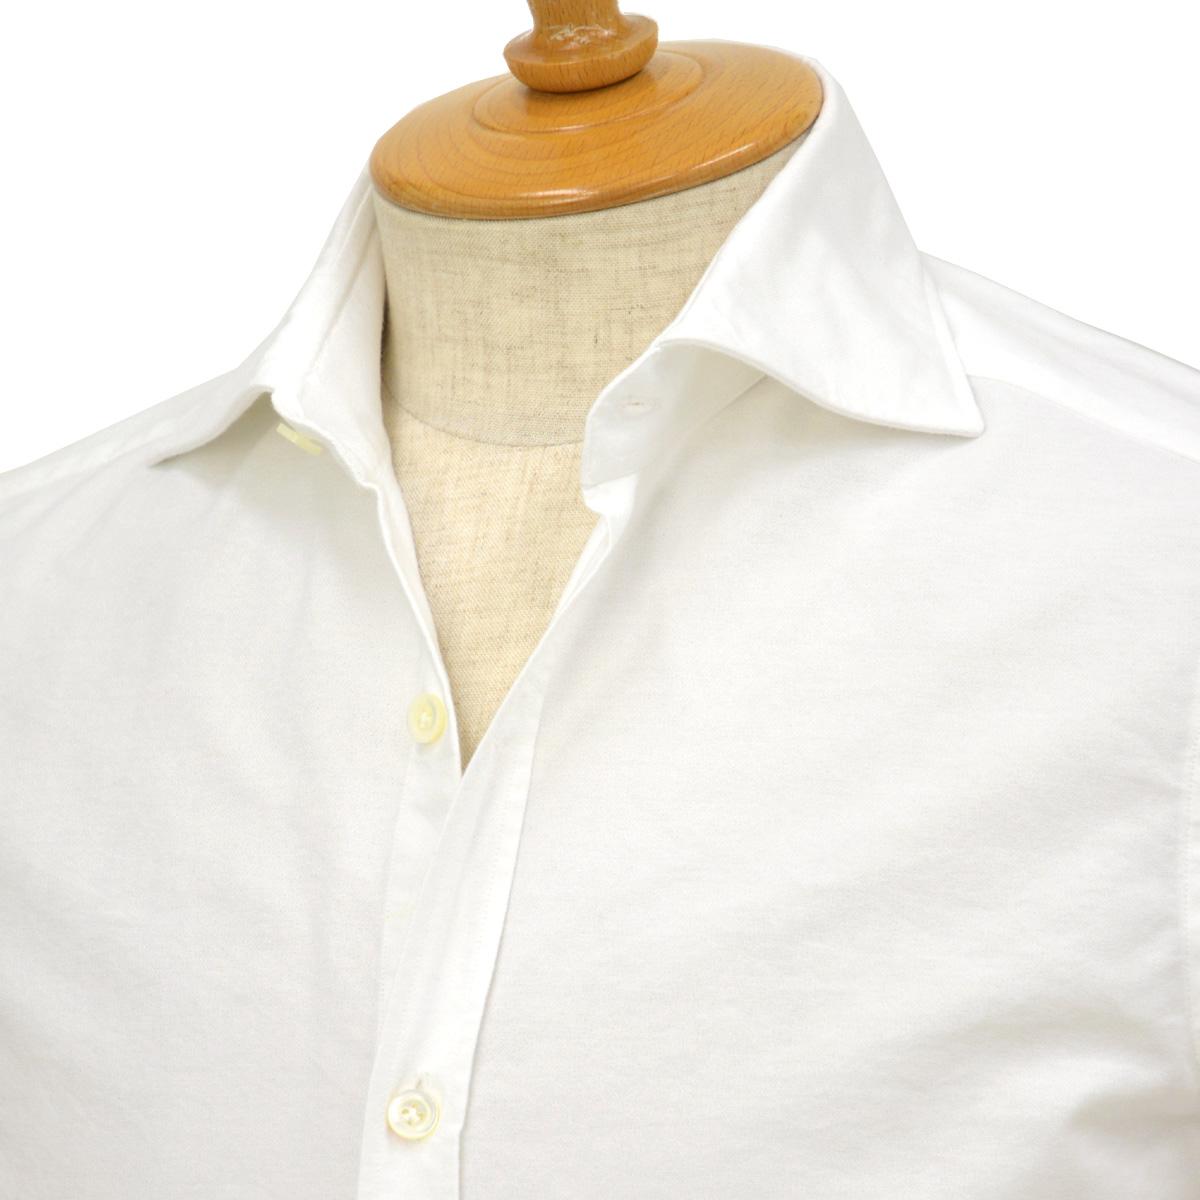 【30%OFF】【size36,38】Giannetto【ジャンネット】オックスフォードシャツ SLIMFIT 14637L81 001 コットン ホワイト